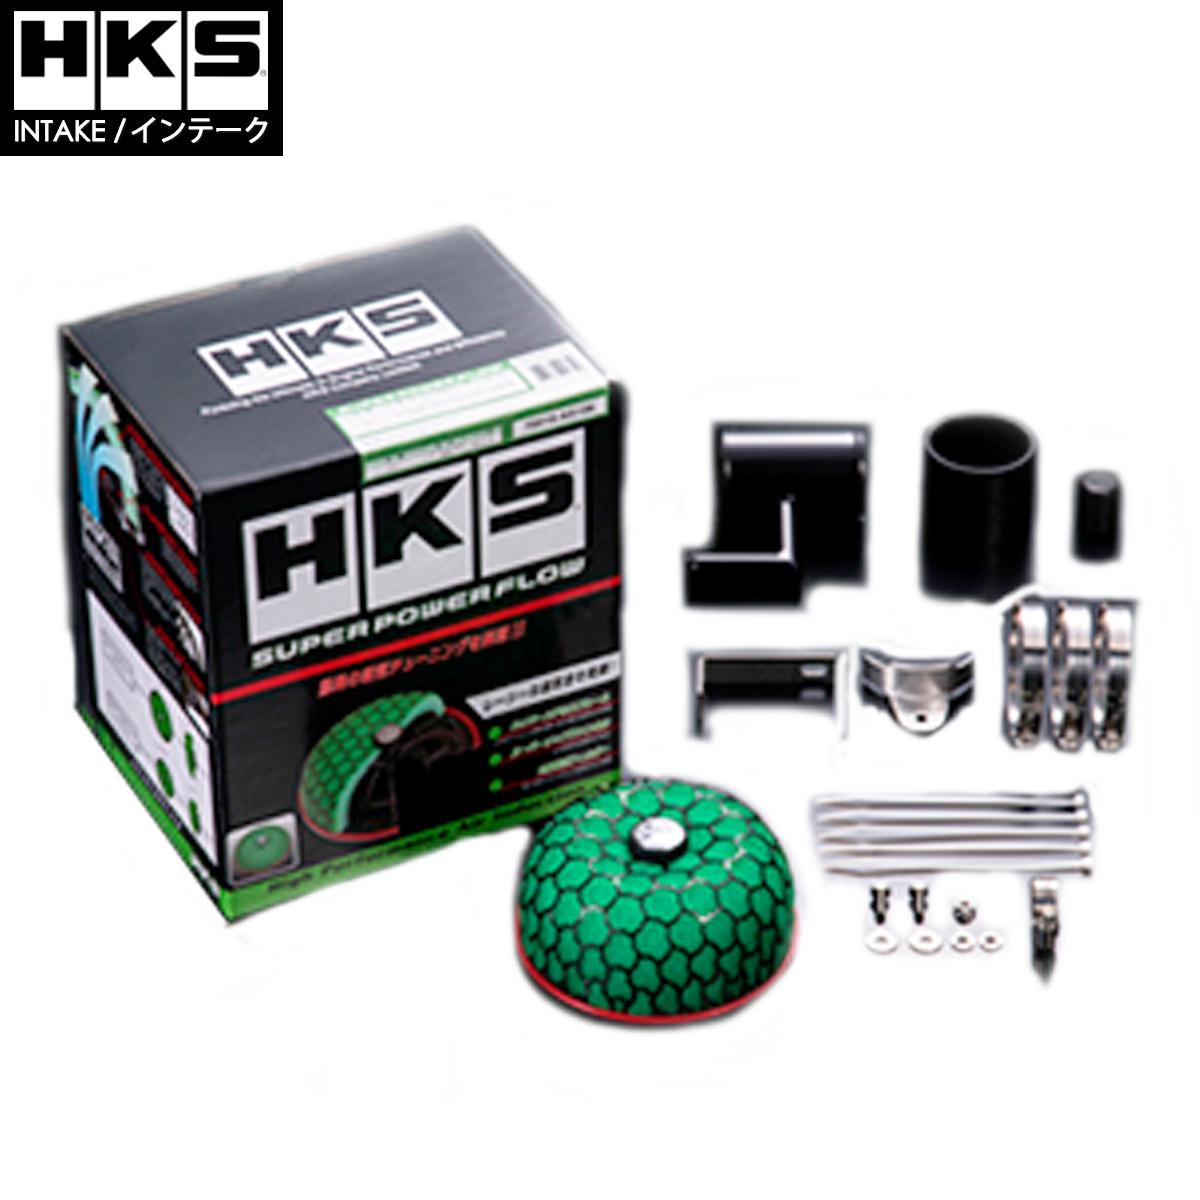 180SX スーパーパワーフロー (K)RPS13 HKS 70019-AN103 インテークシリーズ 個人宅発送追金有